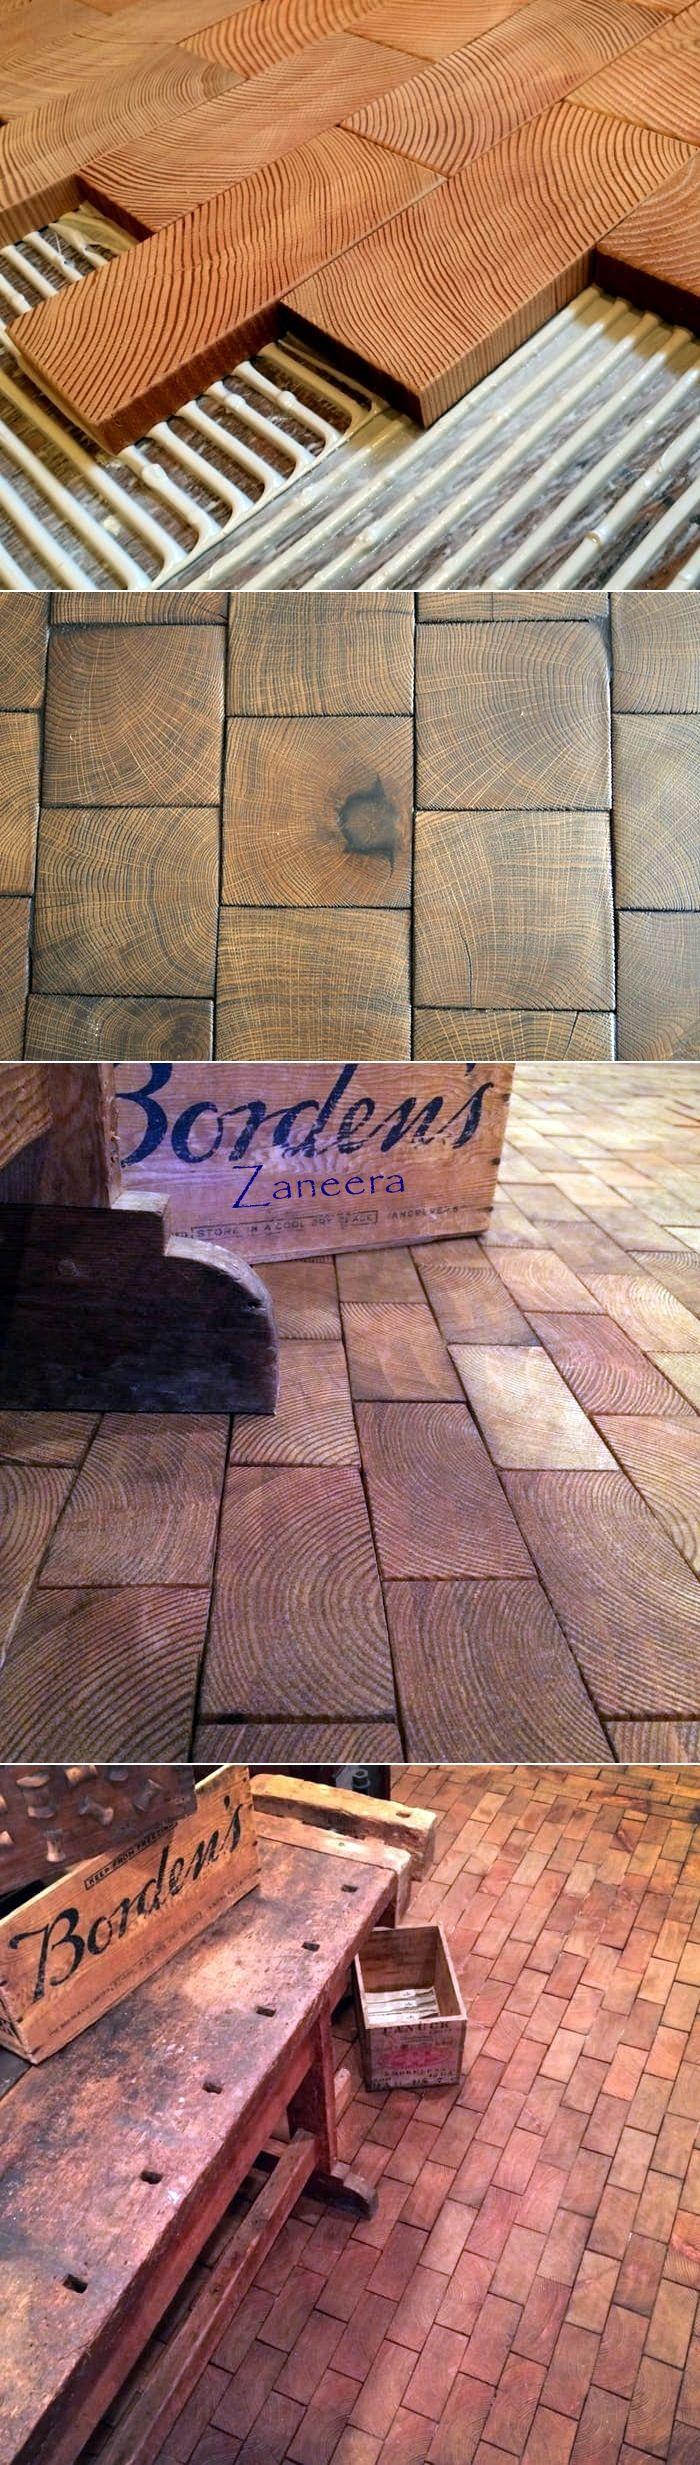 end-grain block flooring from http://www.apartmenttherapy.com/renovation-inspiration-cartolinas-diy-endgrain-block-flooring-198394